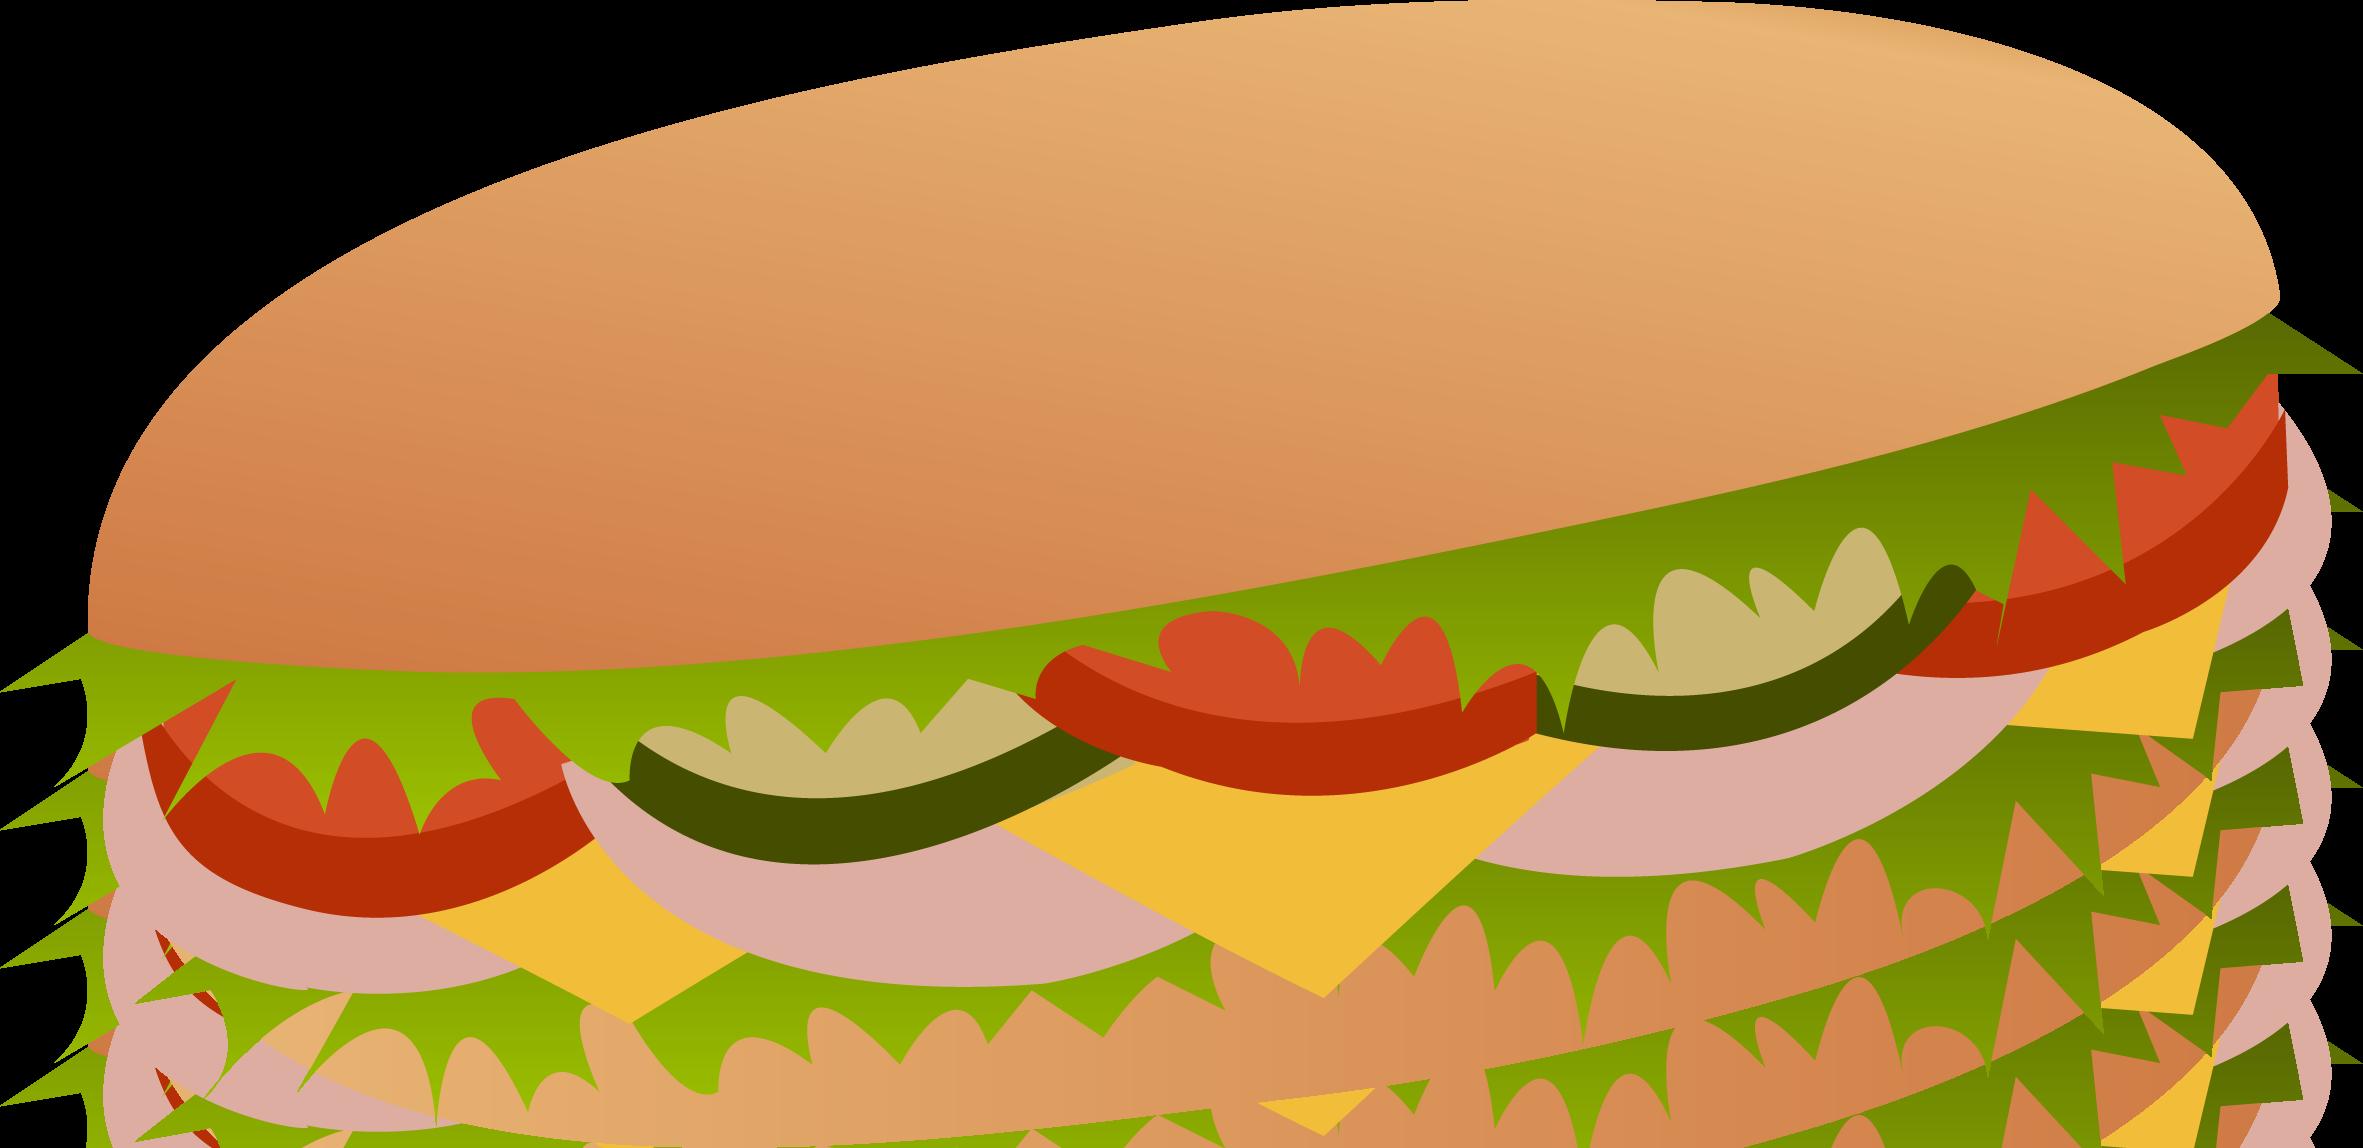 Turkey sandwich clip art. Maracas clipart cuban